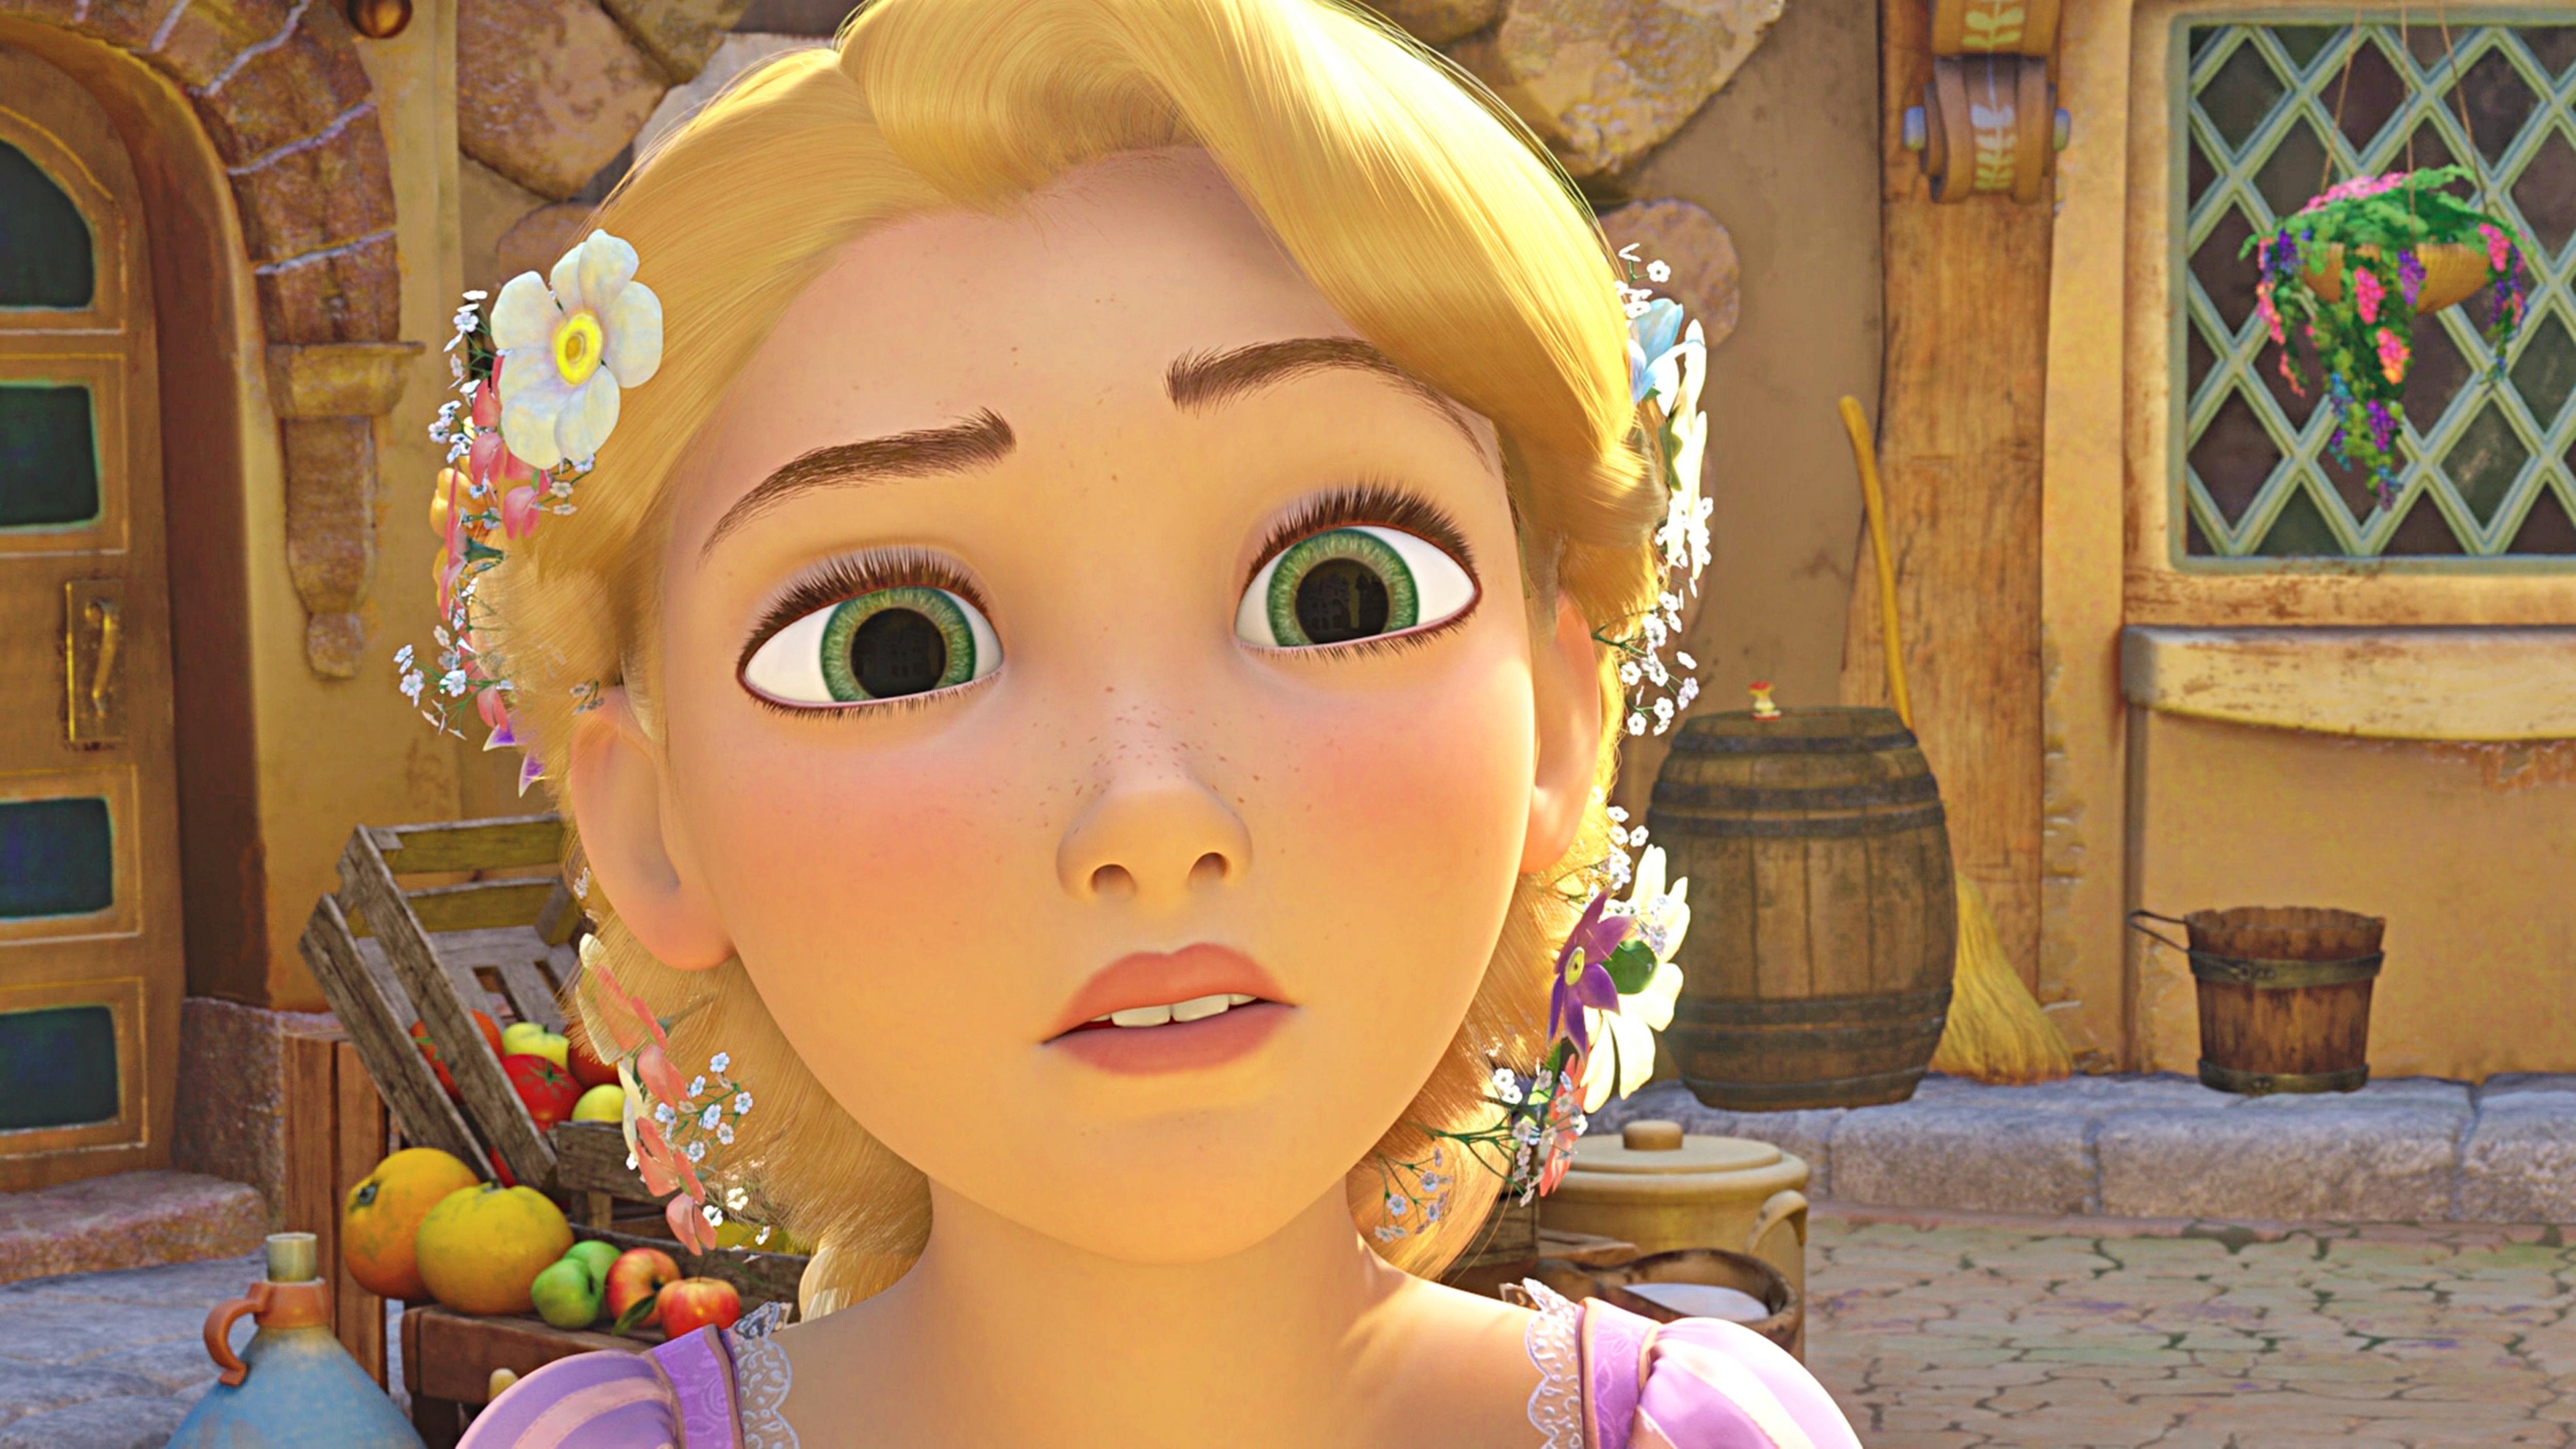 What S Your Most Preferito Feature On Rapunzel Face Head Principesse Disney Fanpop